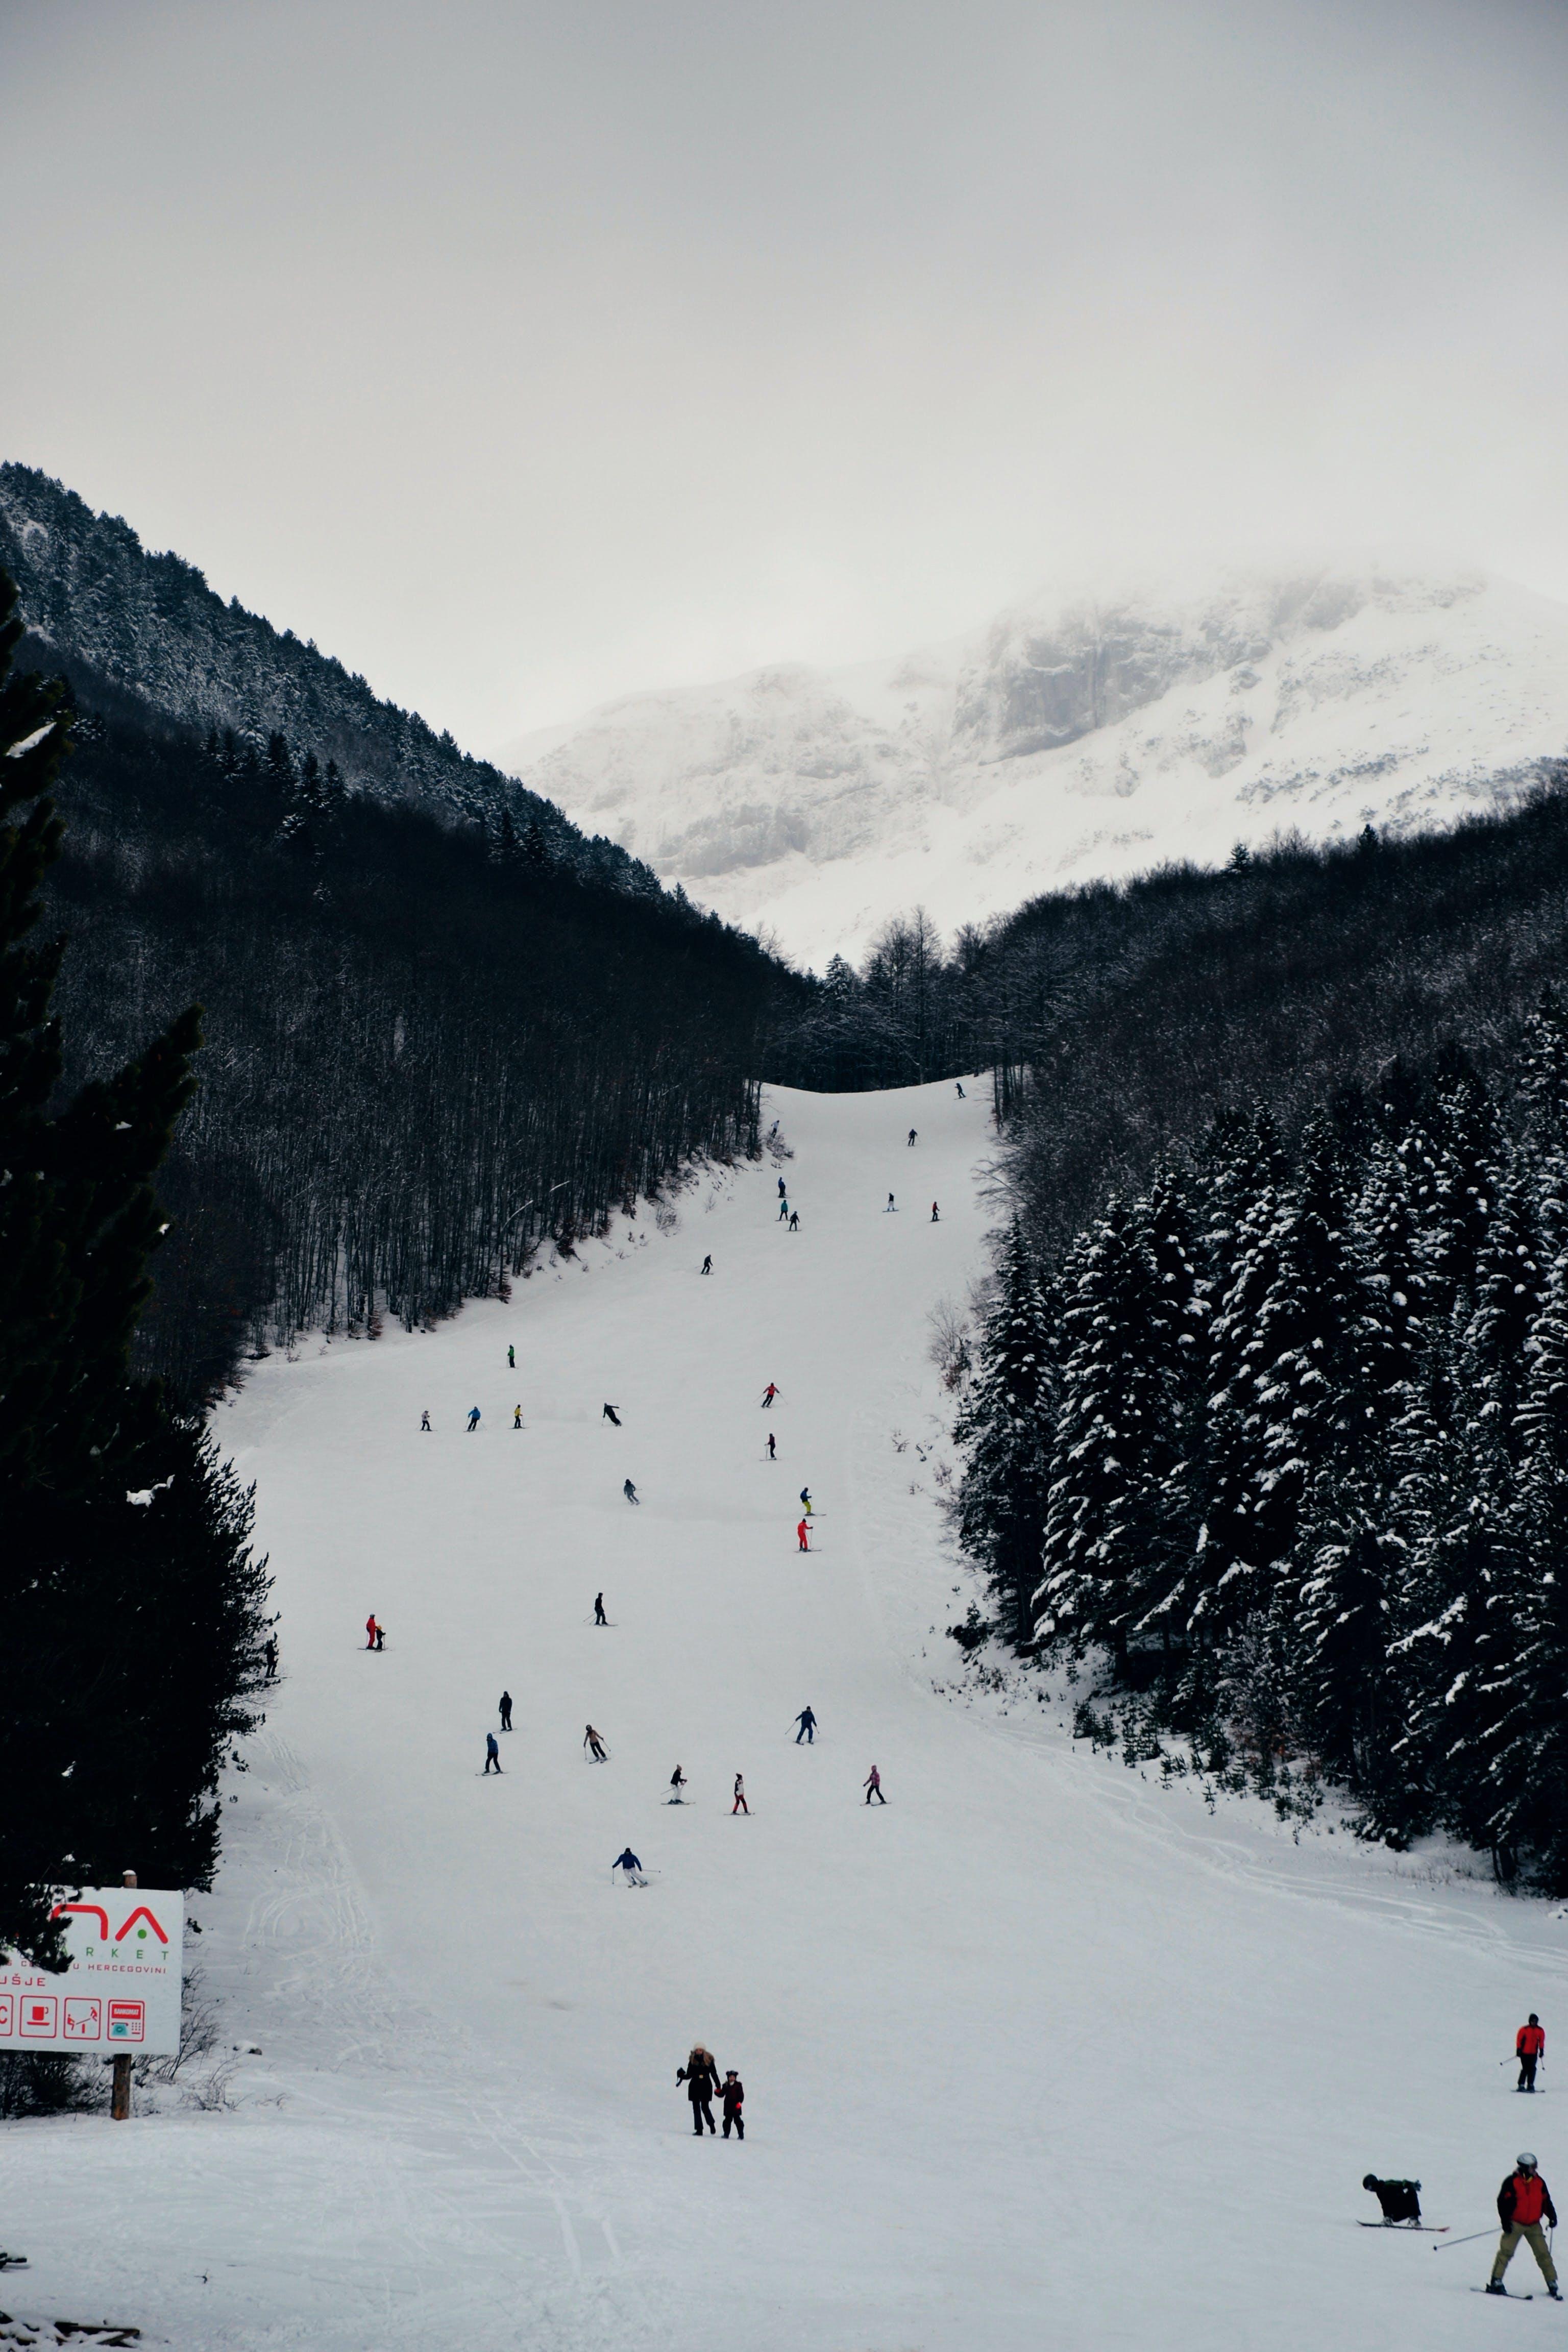 Snowboard and Ski Lanscape